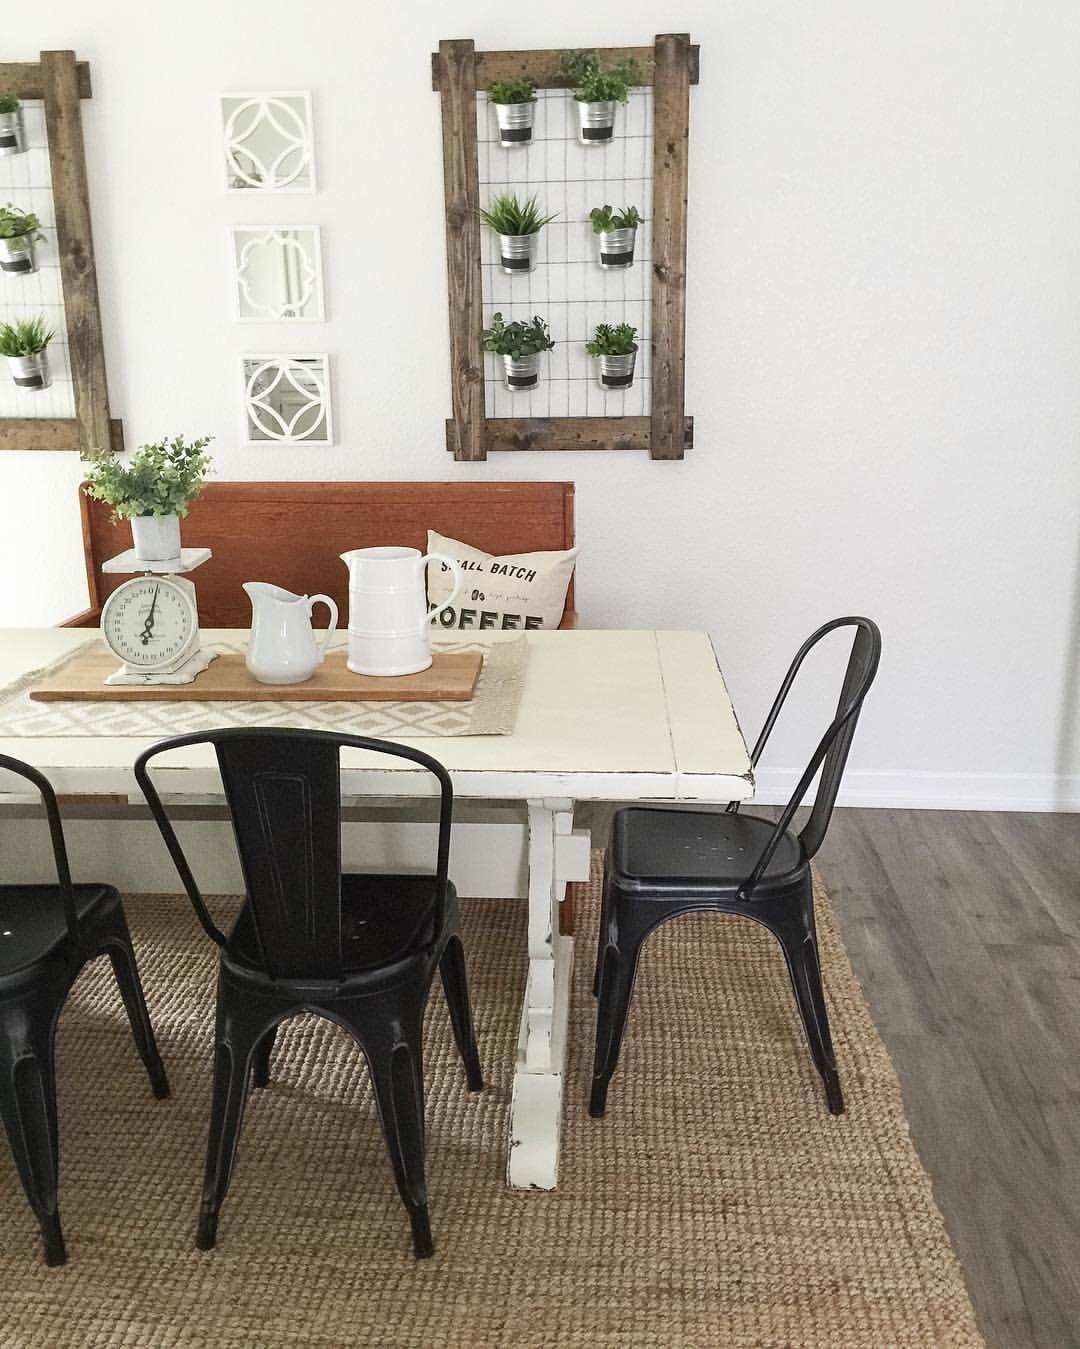 Farmhouse Dining Room Chairs Beach Lounge White Table Black Metal Neutral Decor Jute Rug